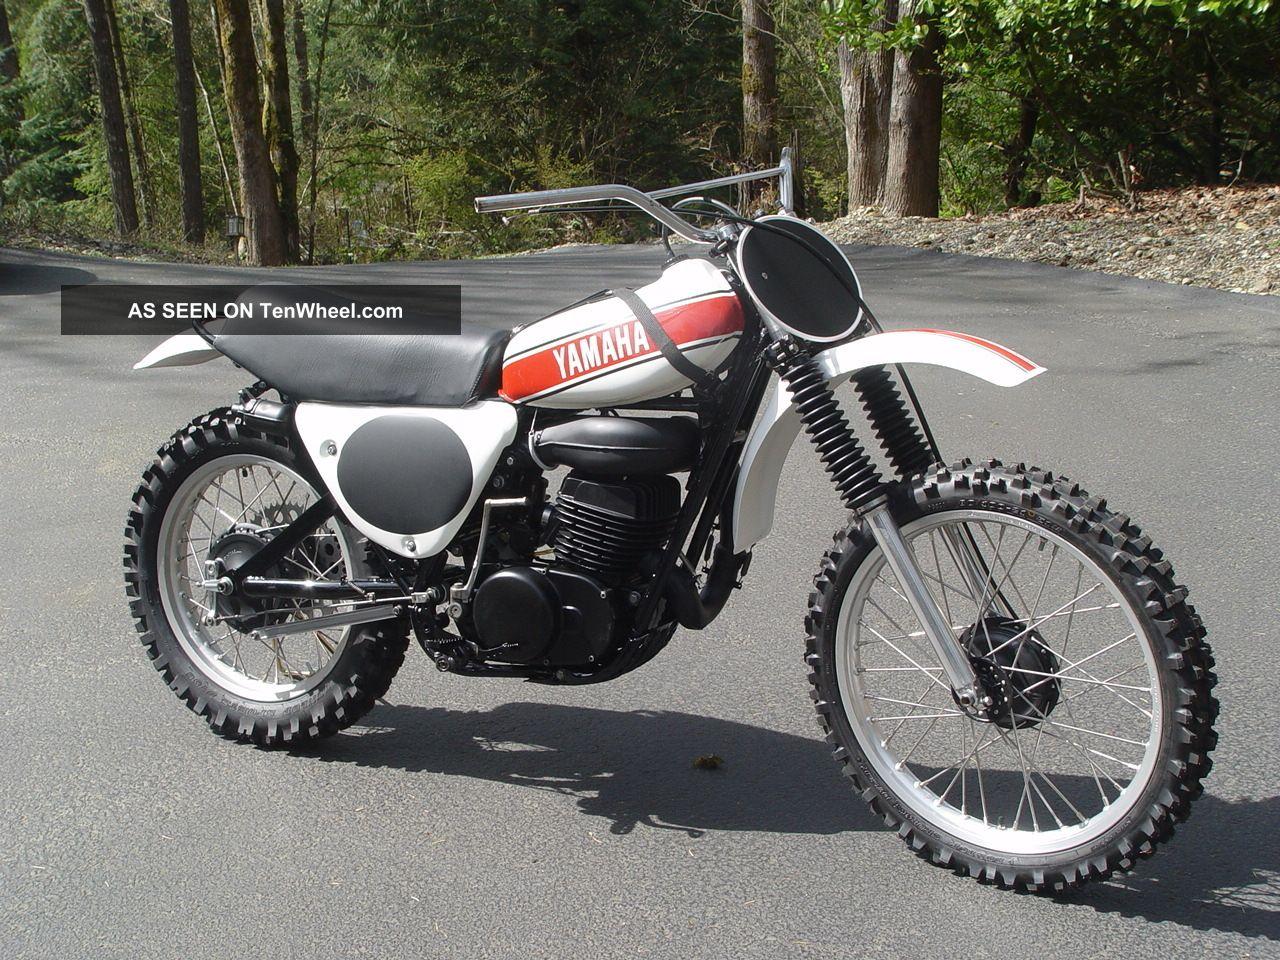 1975 Yamaha Yz 360 B Ow Replica Project Needs Finishing Ahrma Mx Motocross YZ photo